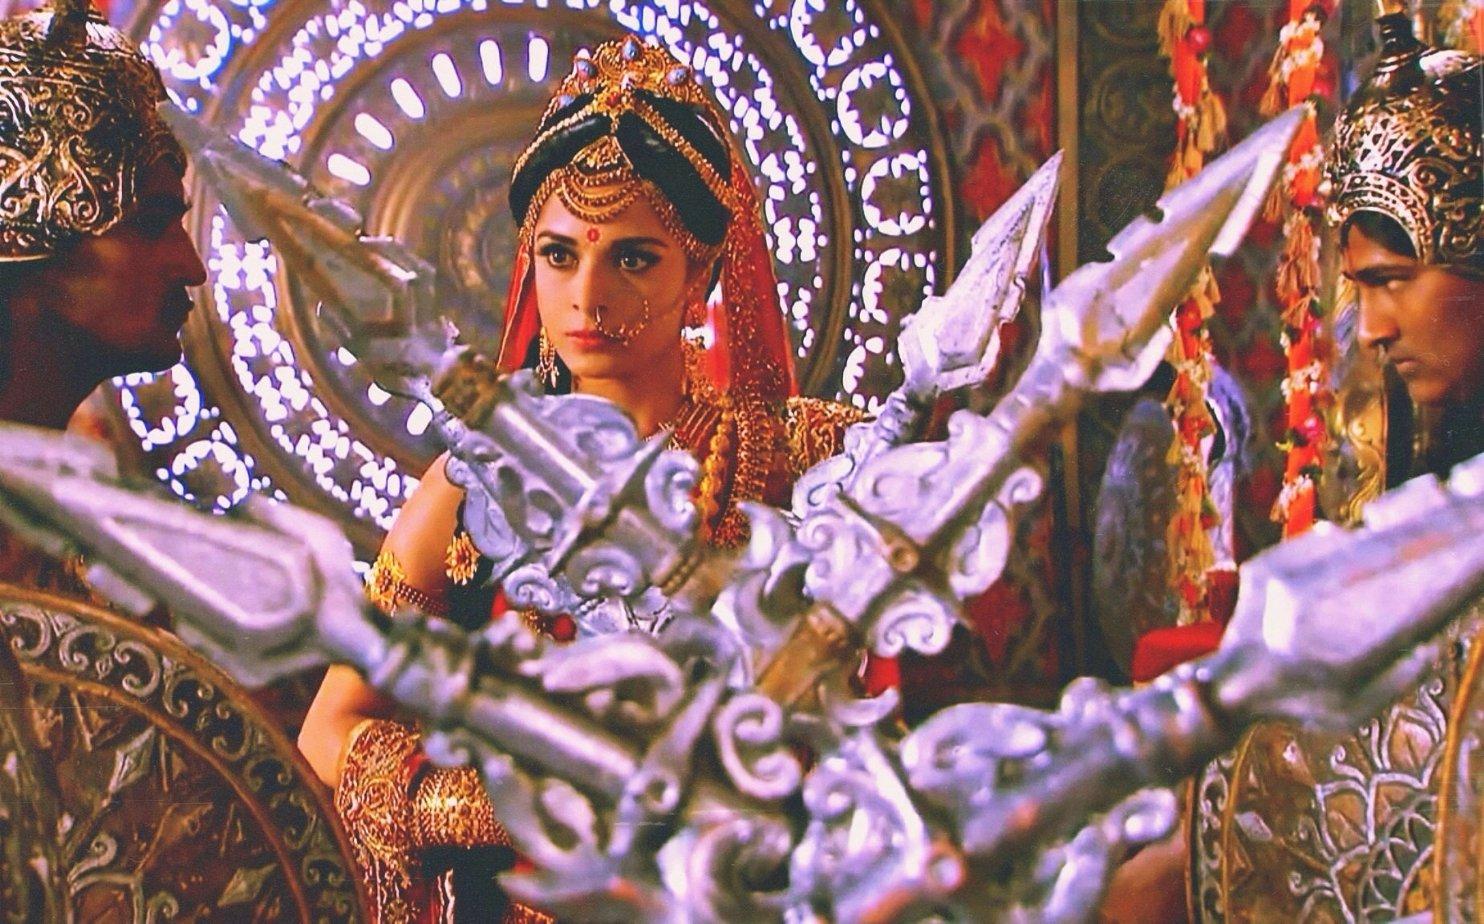 ithuthan mahabharata kathai ringtone in tamil